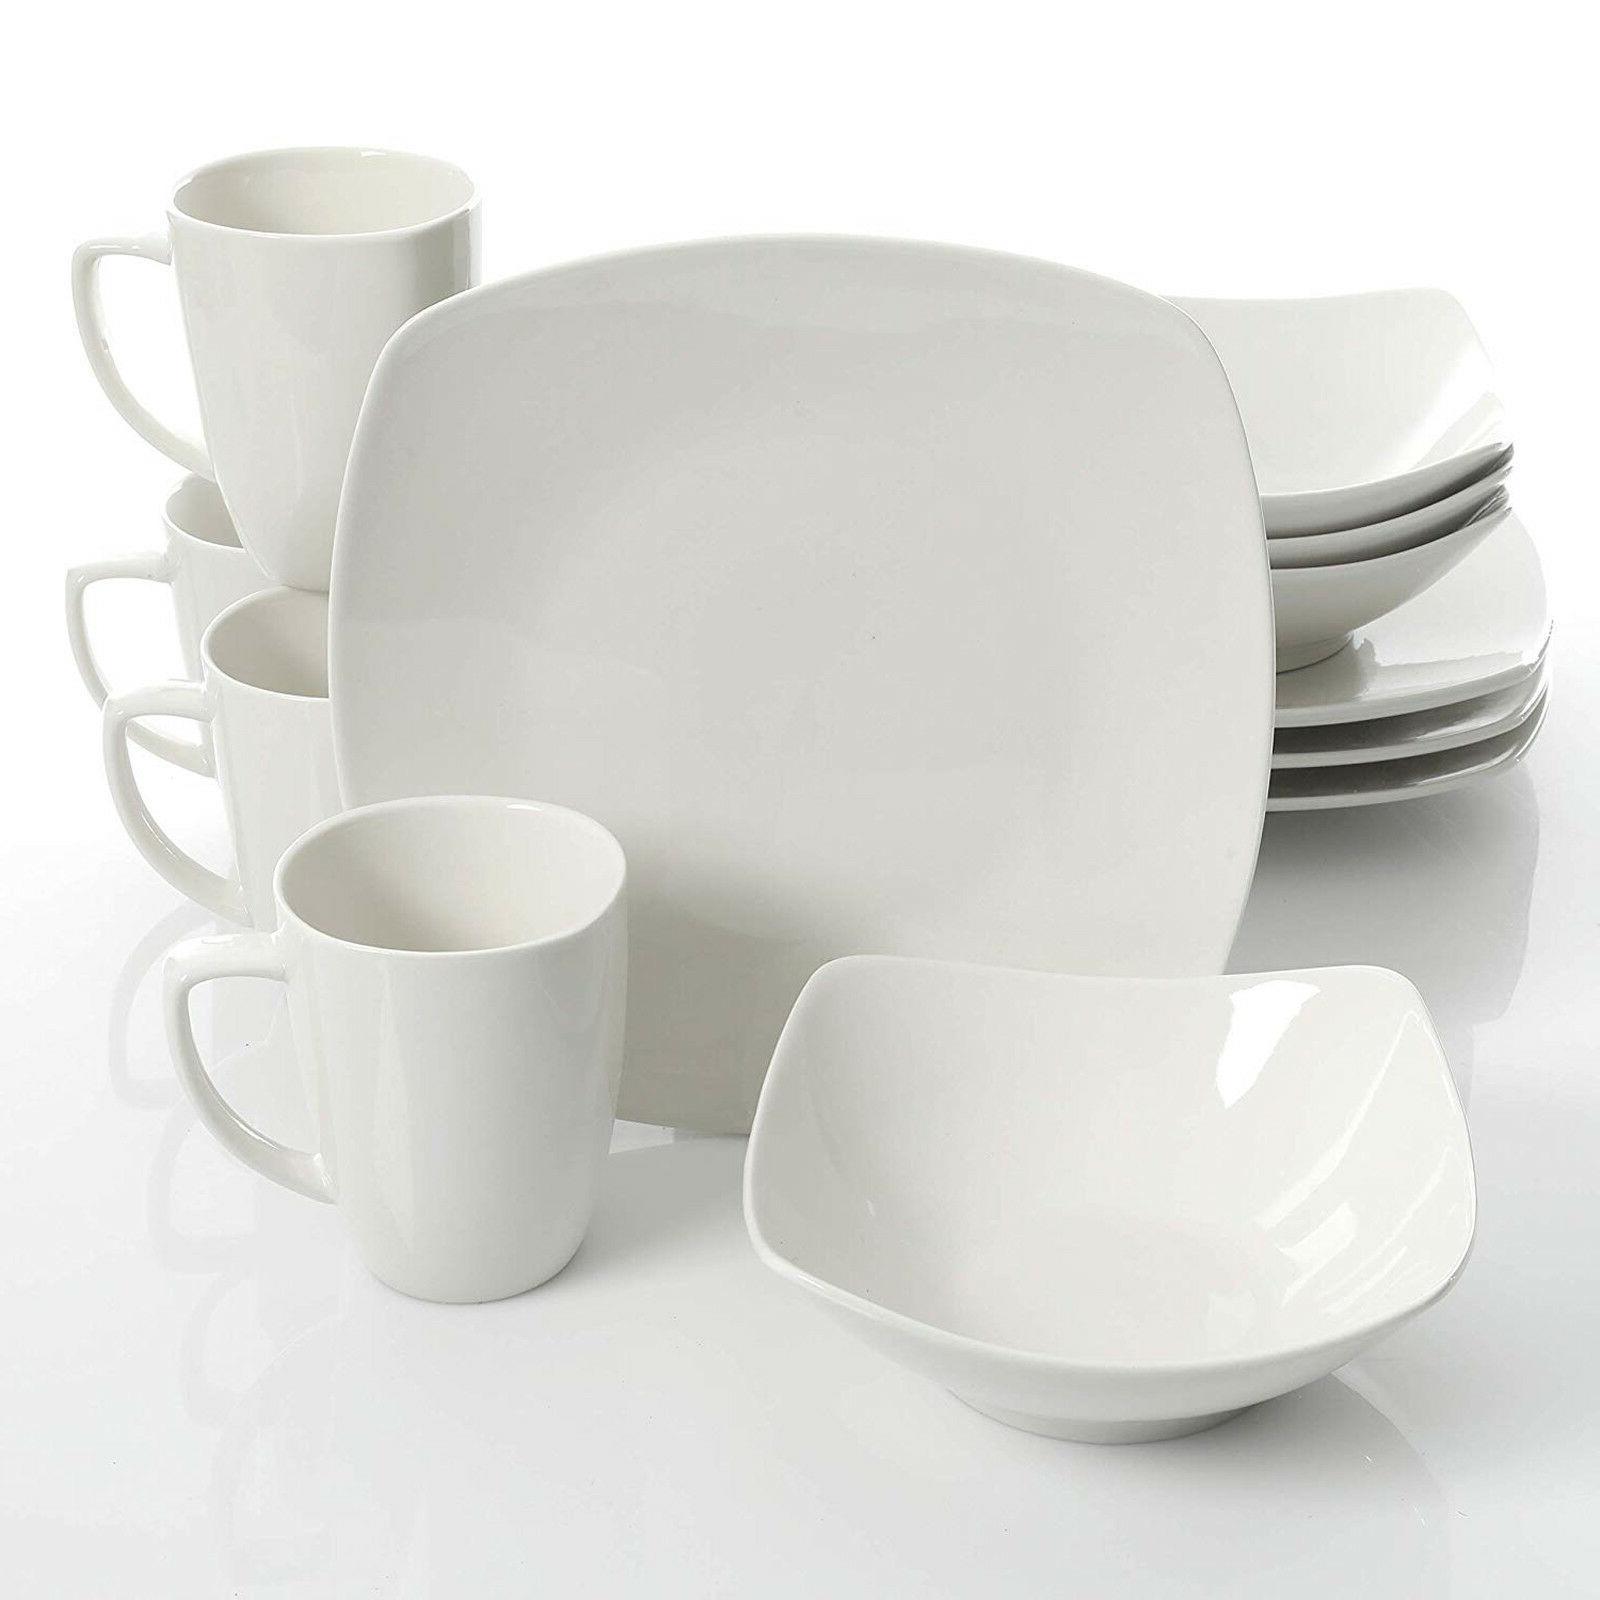 dinnerware set home 12pc kitchen dishes food